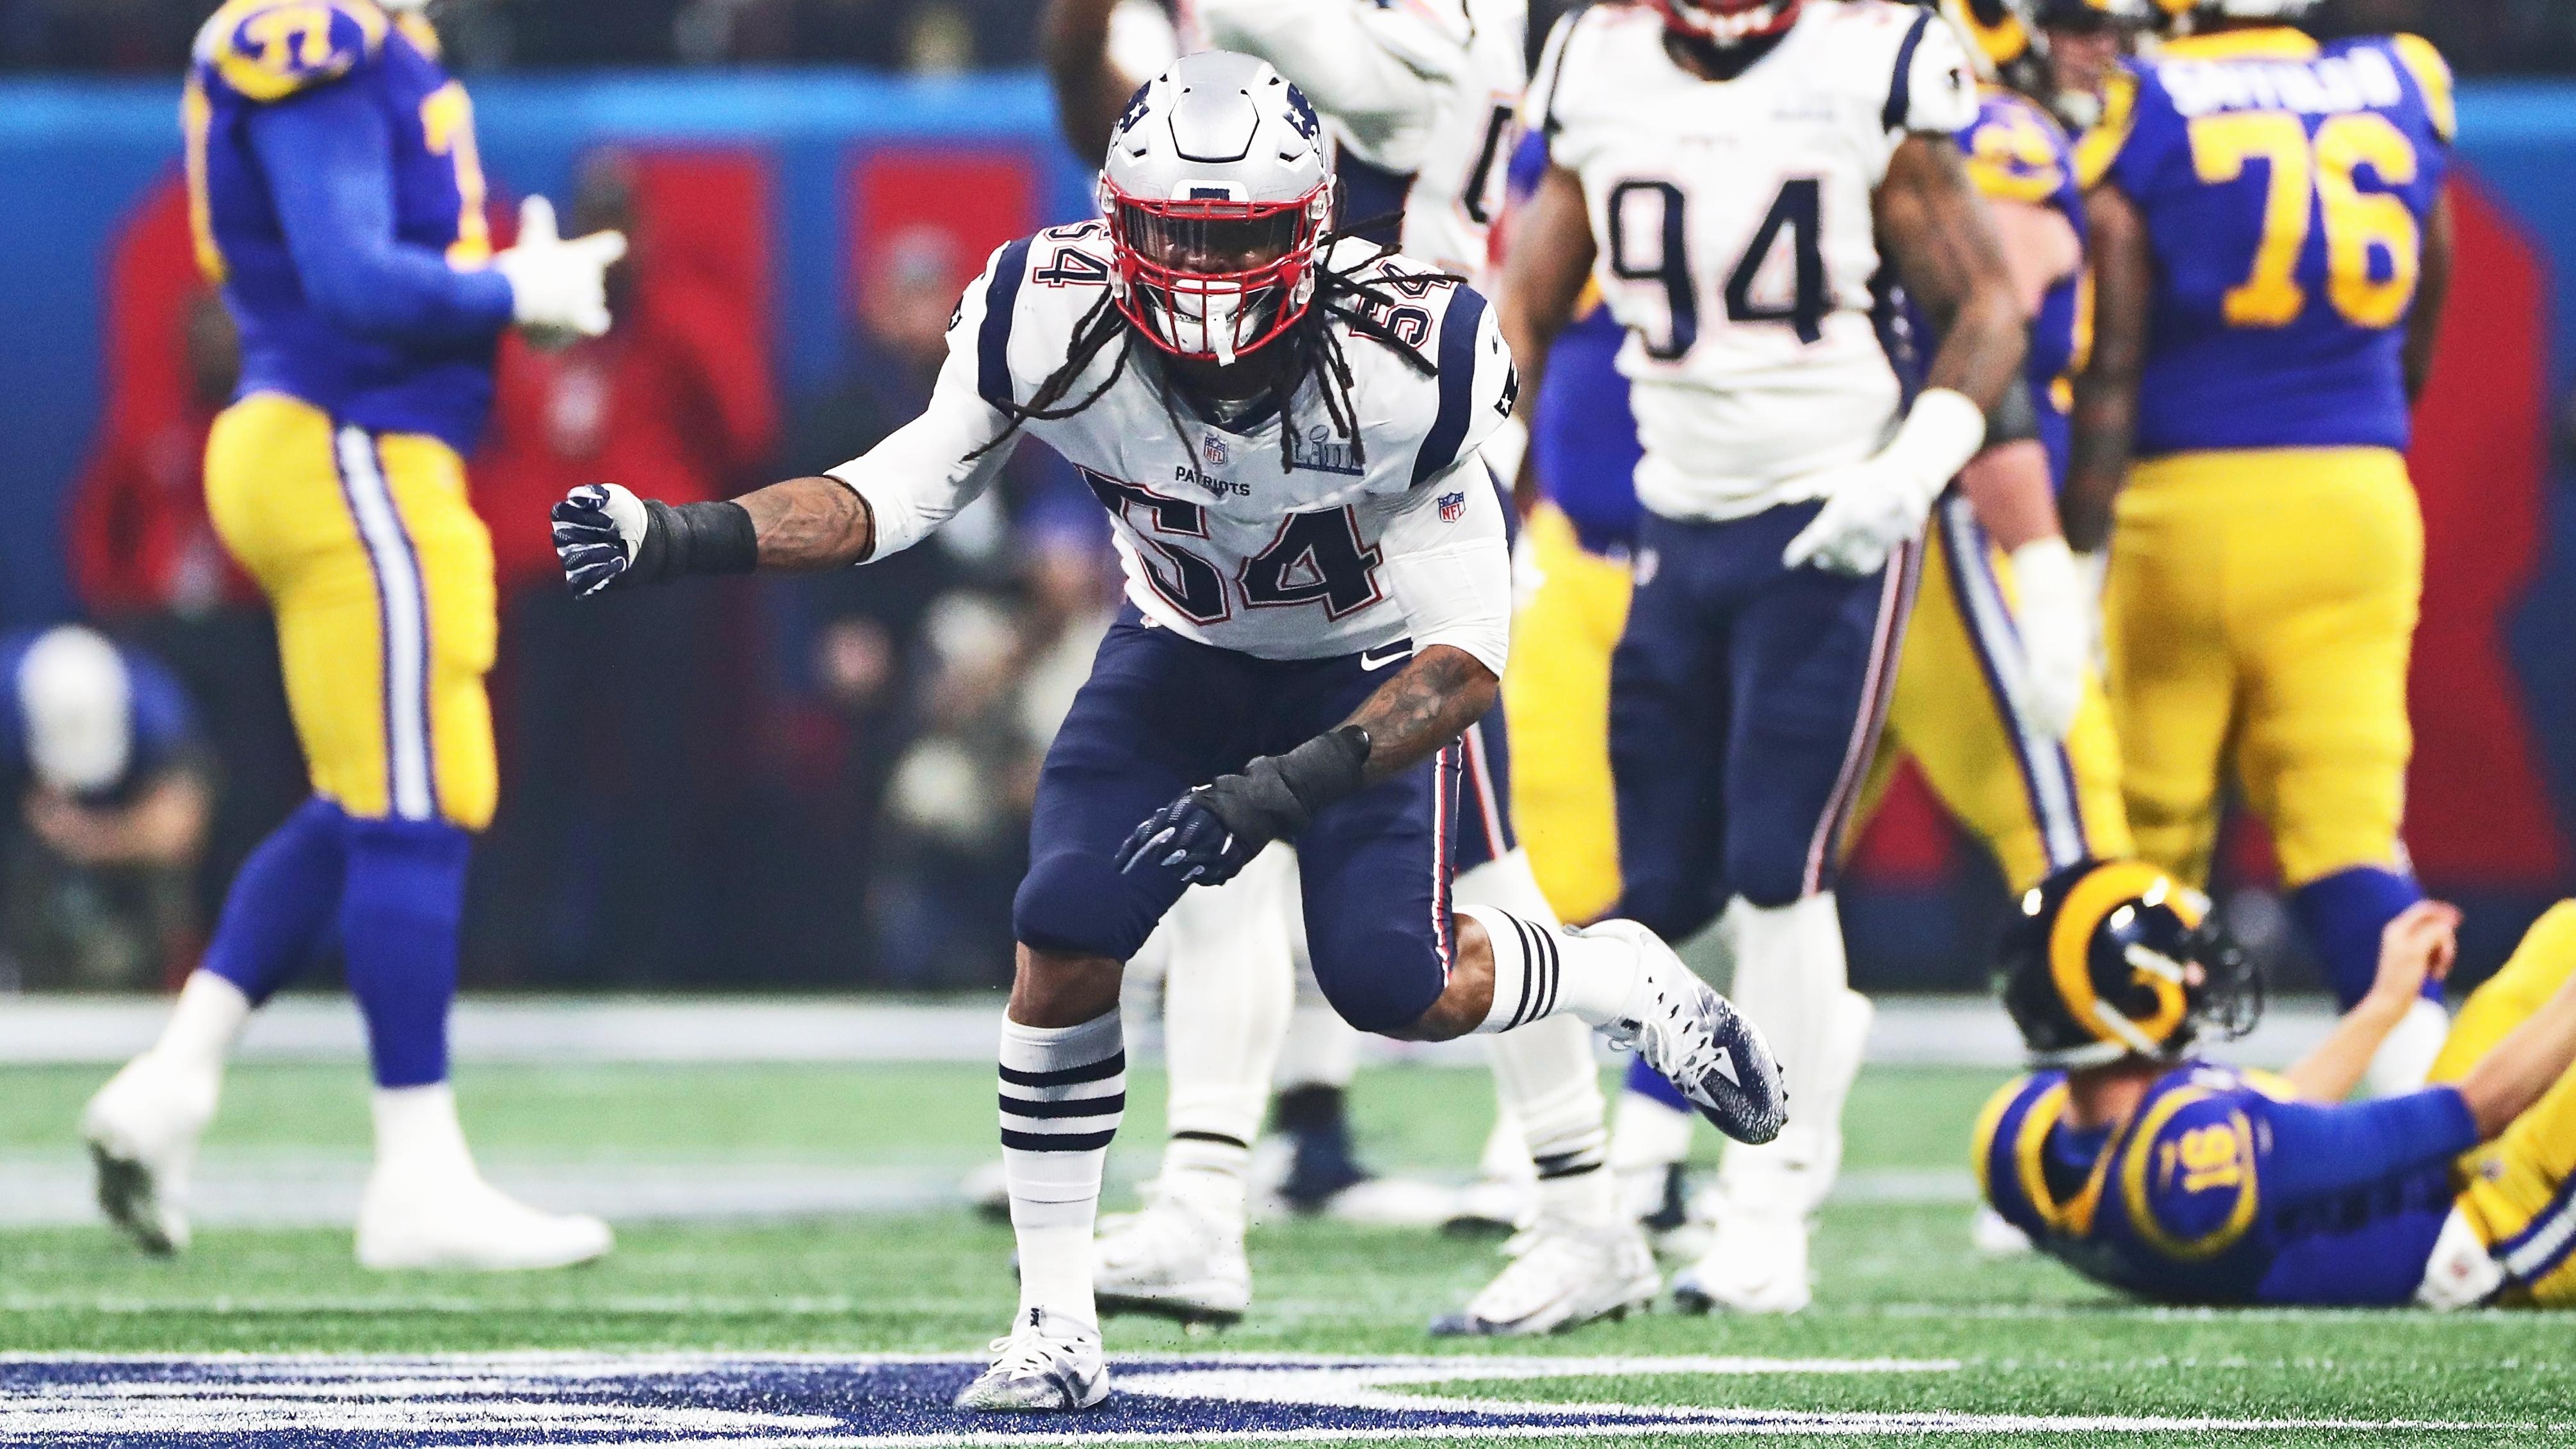 Hightower, Van Noy, Gilmore Can Be Alternate Super Bowl Mvps regarding Super Bowl Mvp Voting 2019